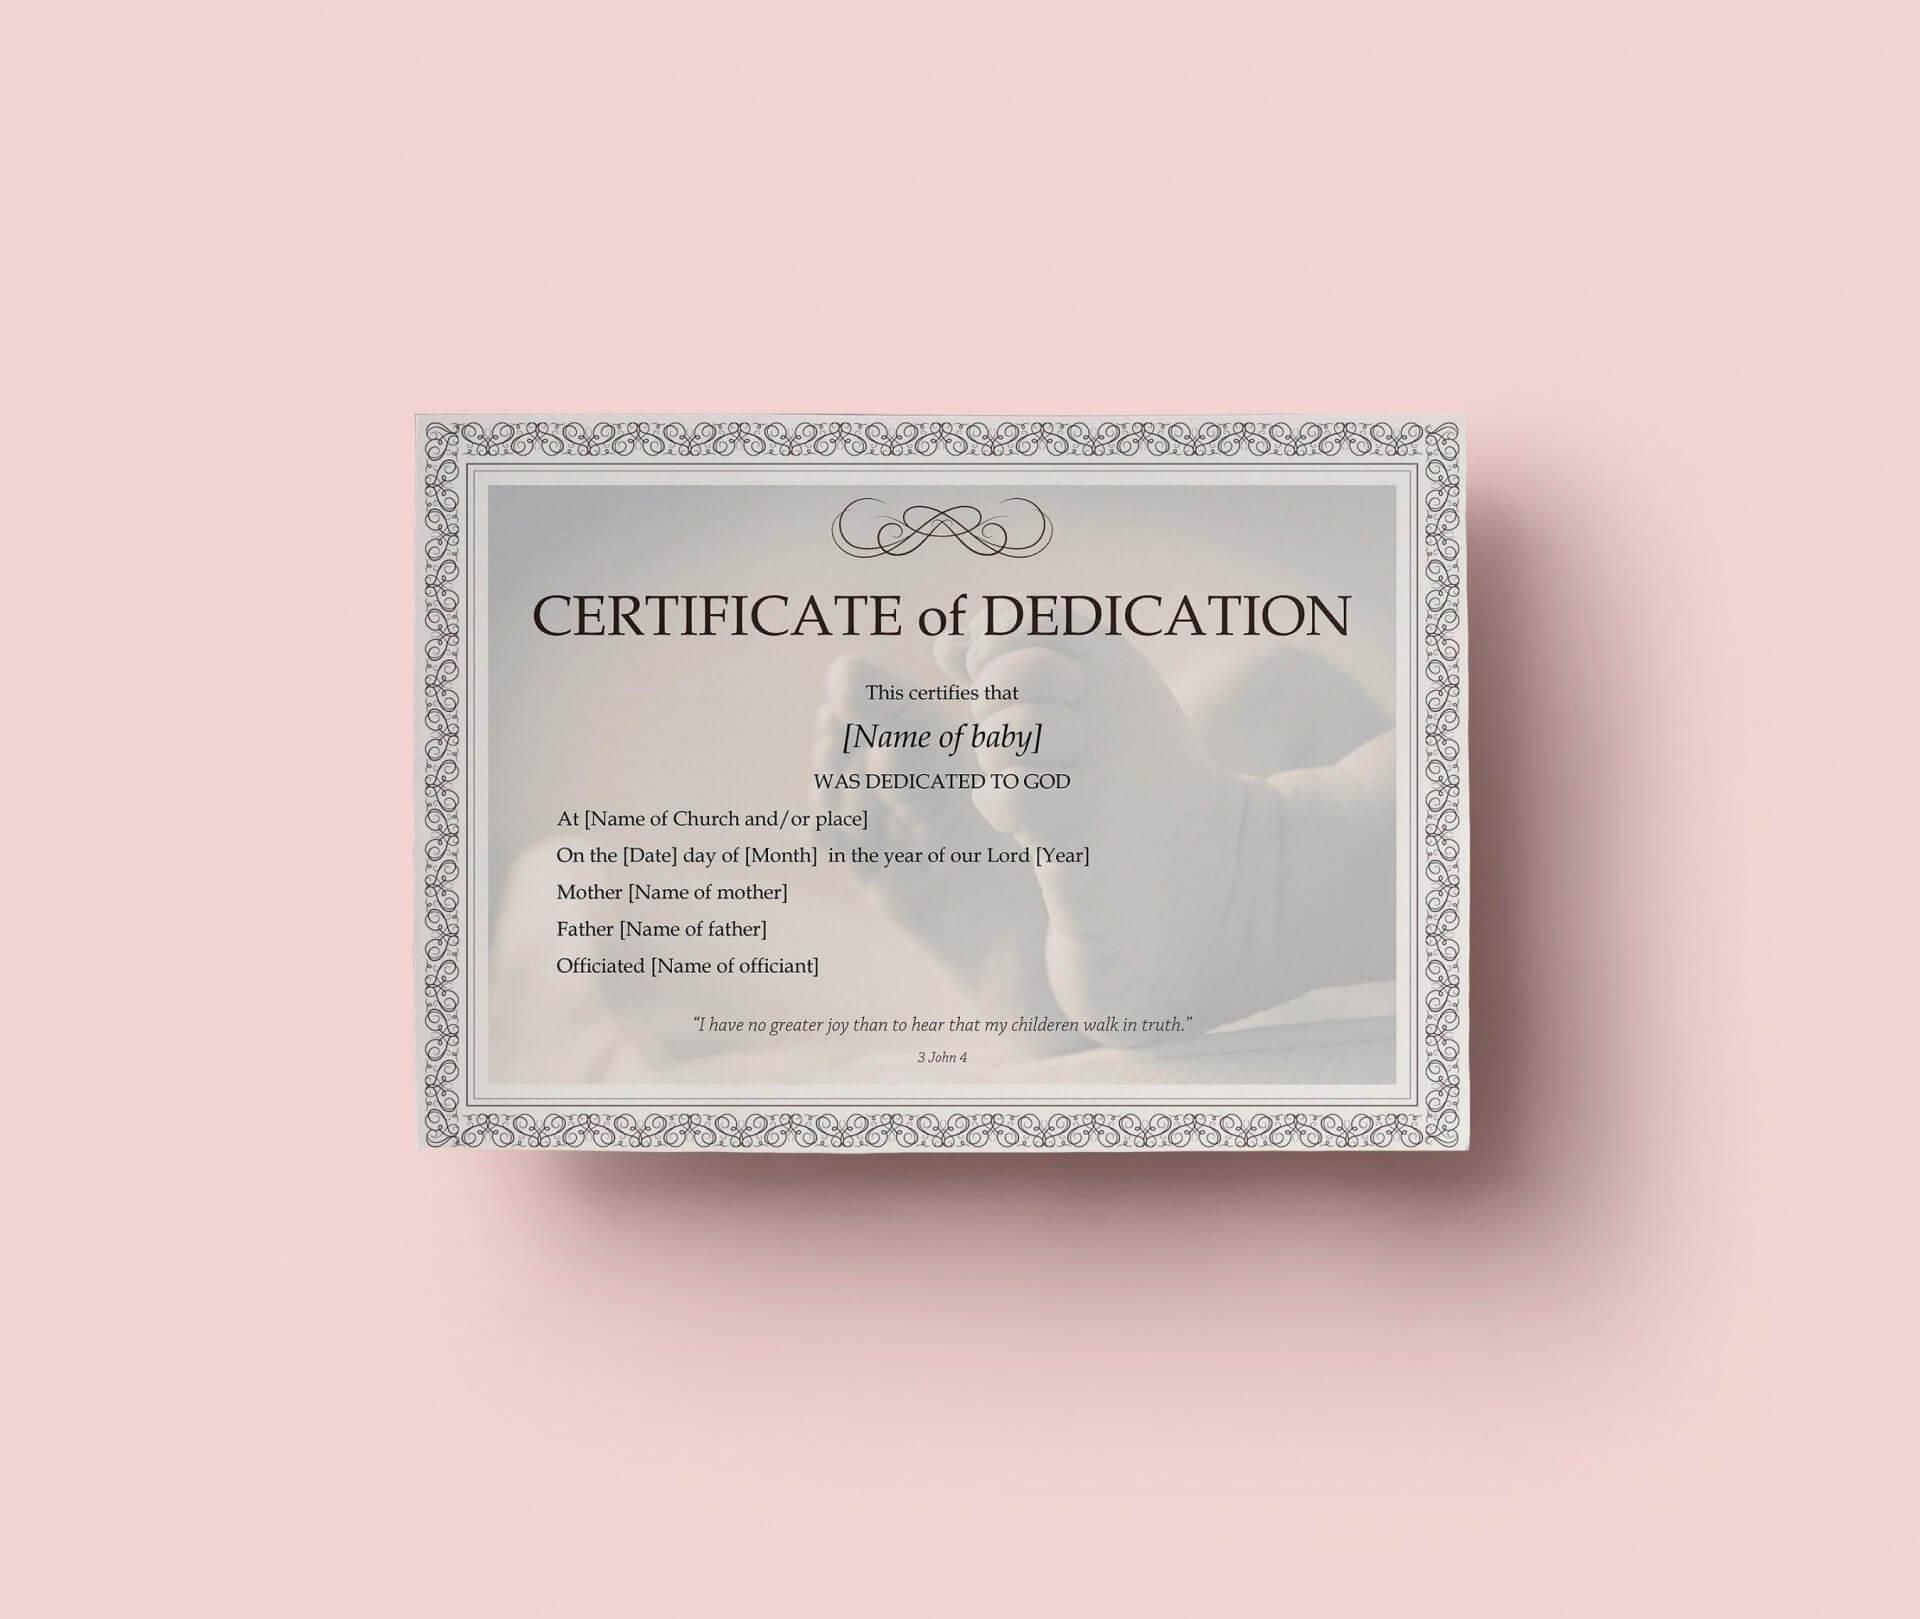 10E2D7 Baby Dedication Certificates C Template Business With Regard To Baby Dedication Certificate Template